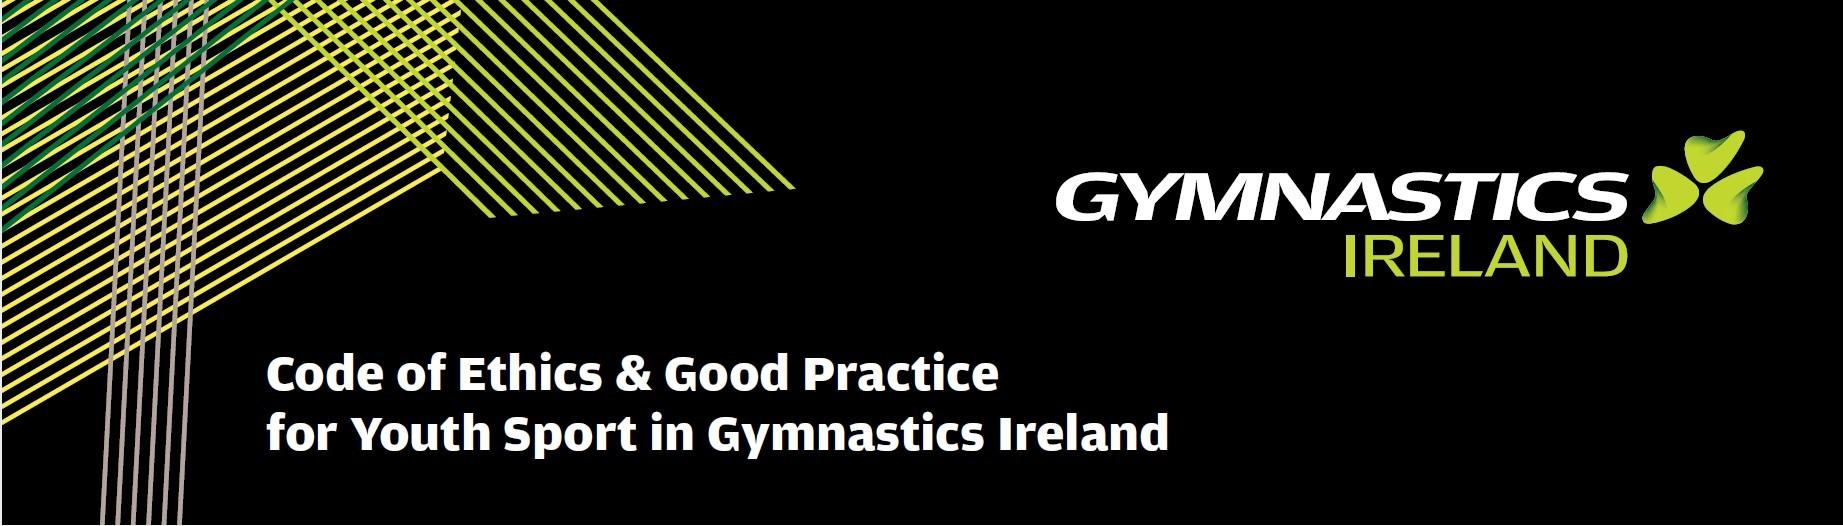 Portlaoise Gymnastics Child welfare Policy